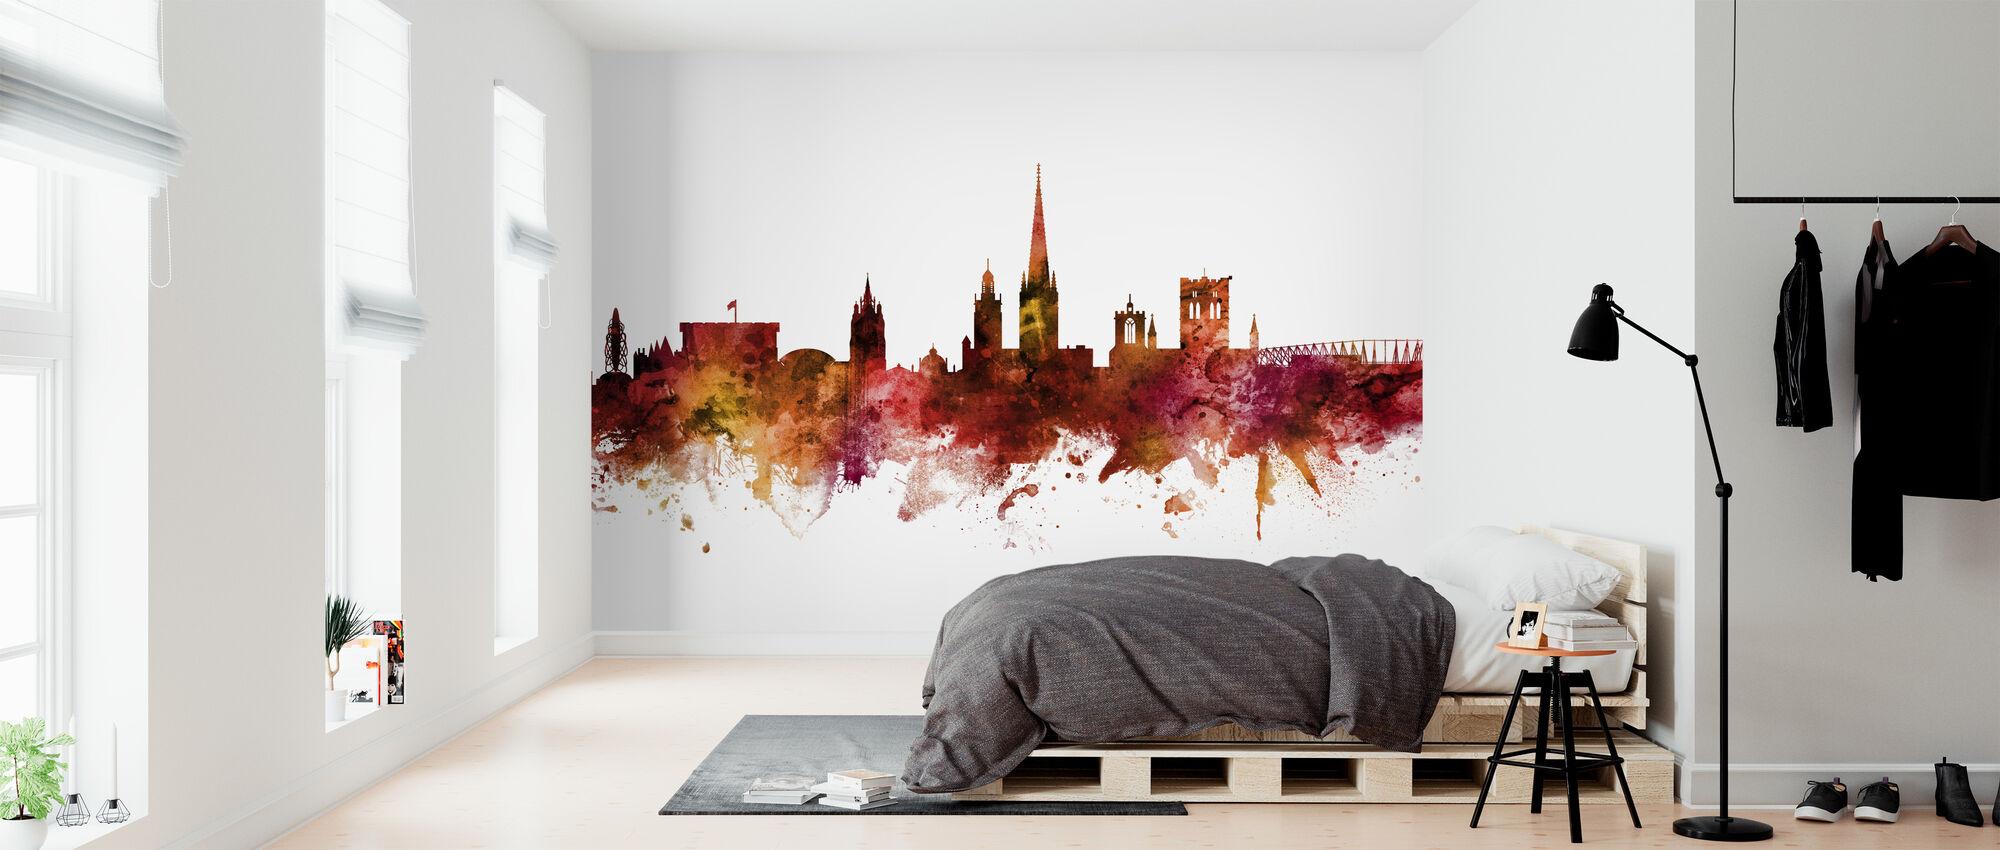 Norwich England Skyline - Wallpaper - Bedroom